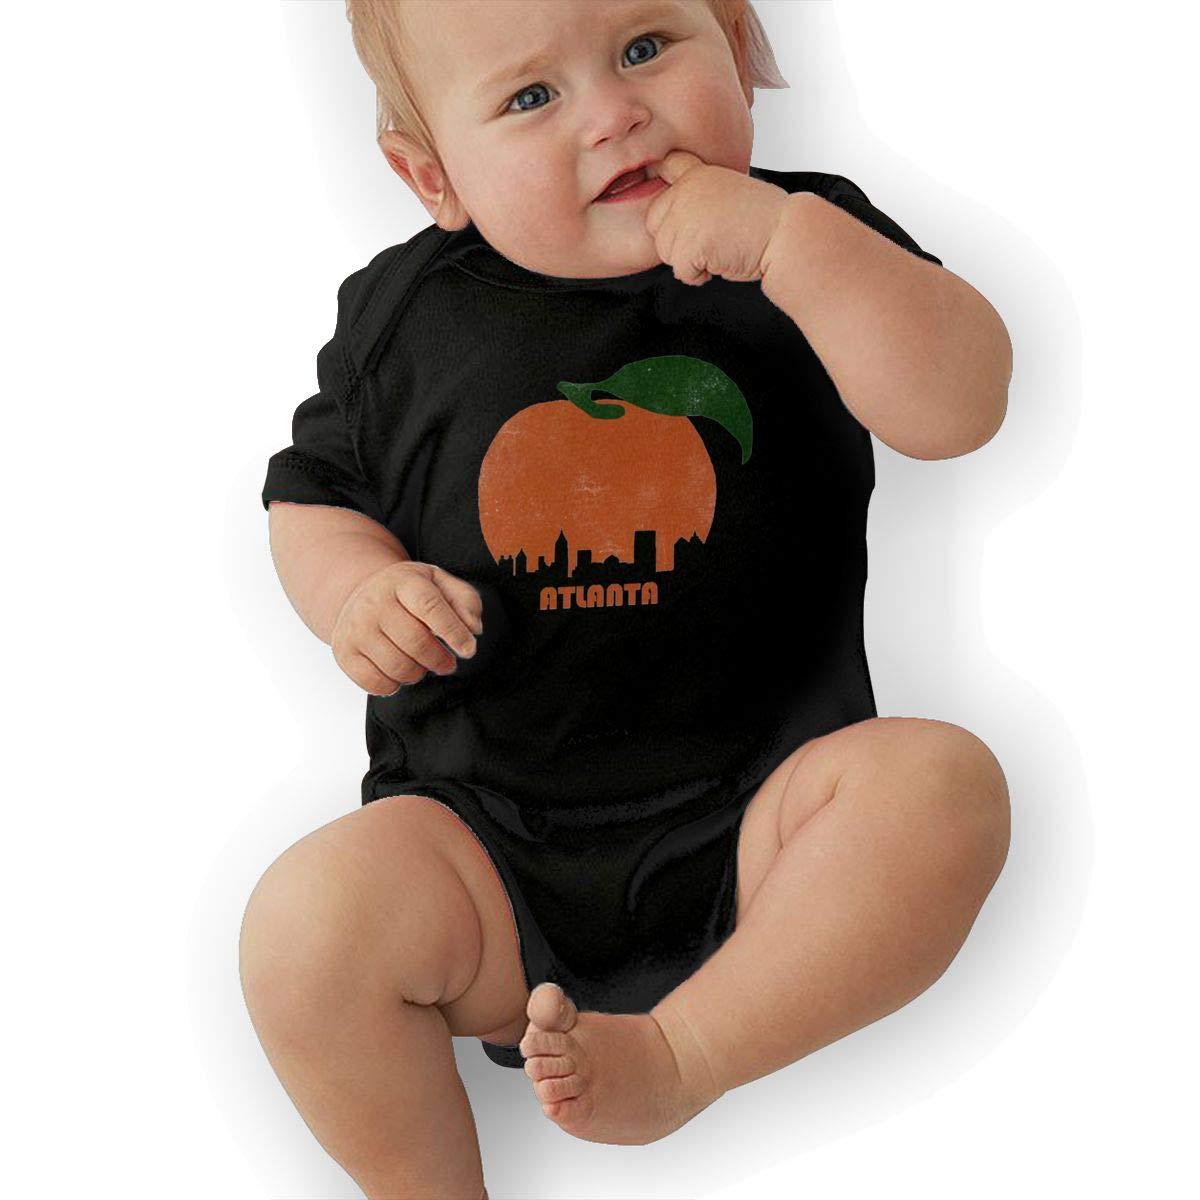 LANBRELLA Retro Atlanta Skyline Infant Babys Cotton Short Sleeves Playsuits Playsuit Bodysuit Clothes